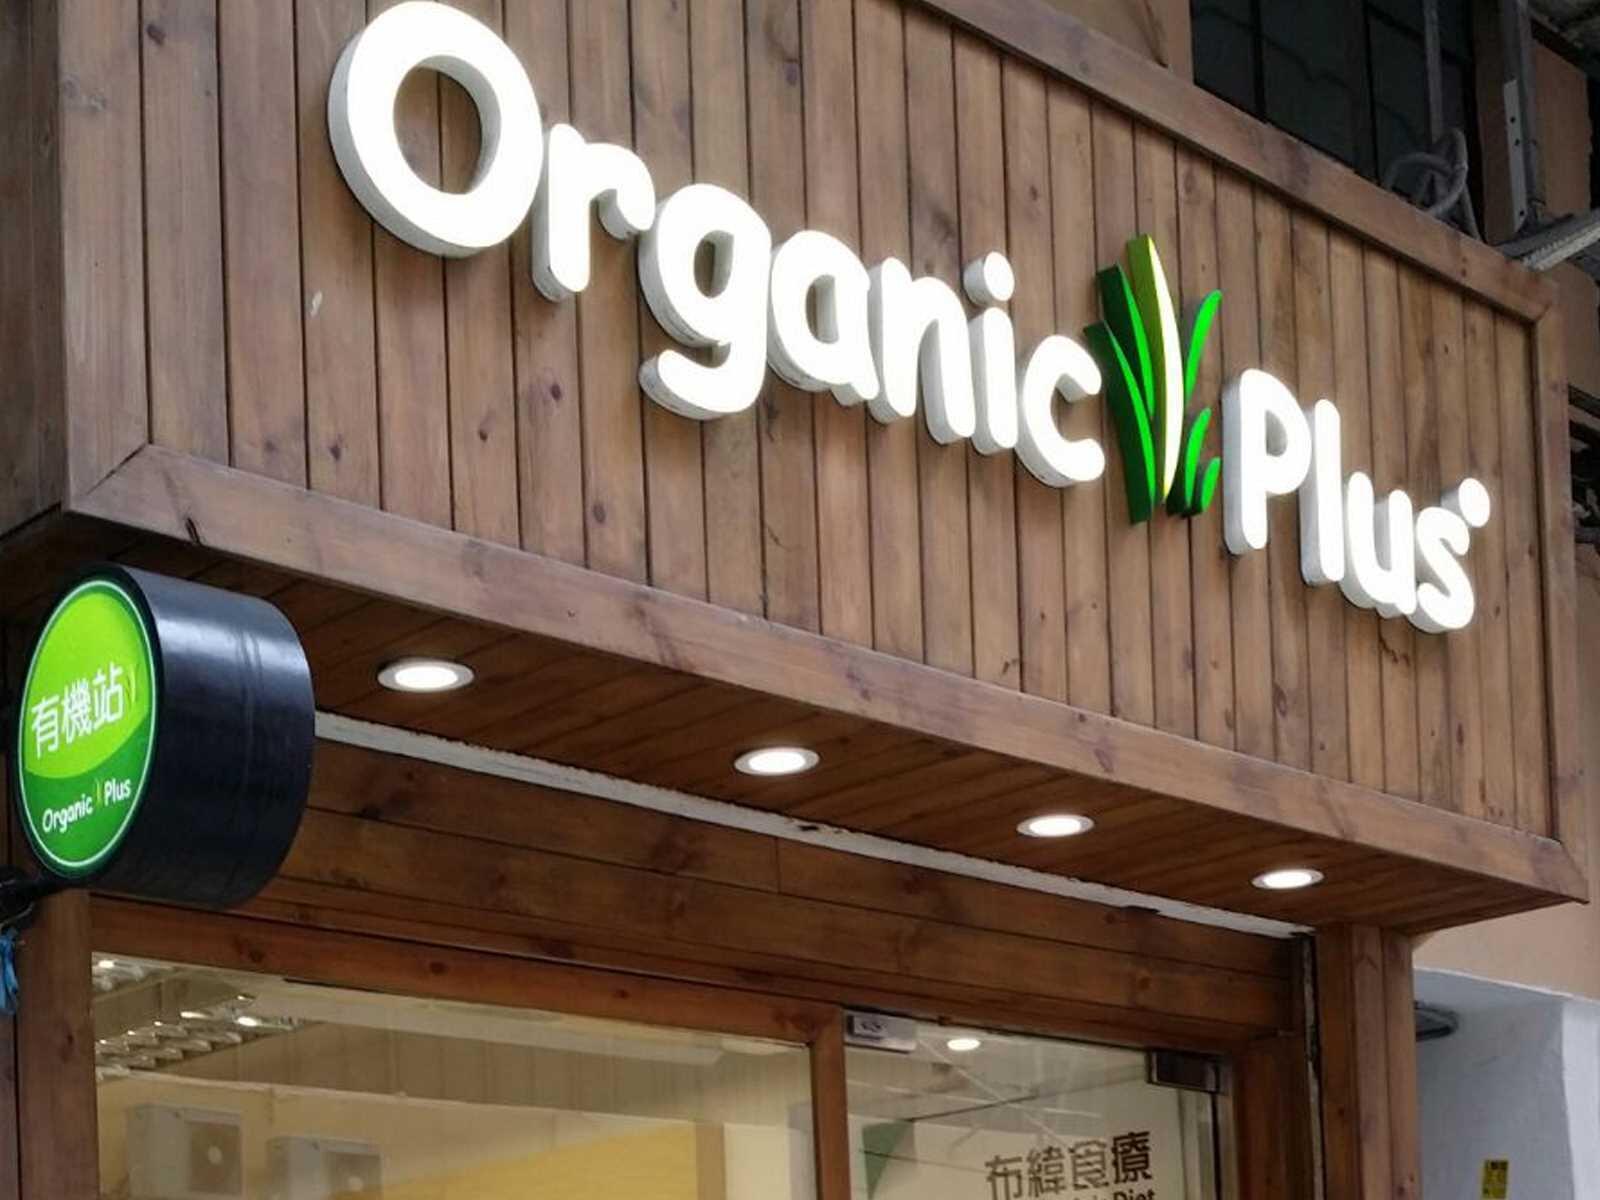 Organic Plus   Sai Ying Pun Shop  Business Hours:11am-8pm Mobile:2548 2392 Email:syp@organicplus.com.hk Address:G/F, 233 Queen's Road West,  Sai Ying Pun, H.K.